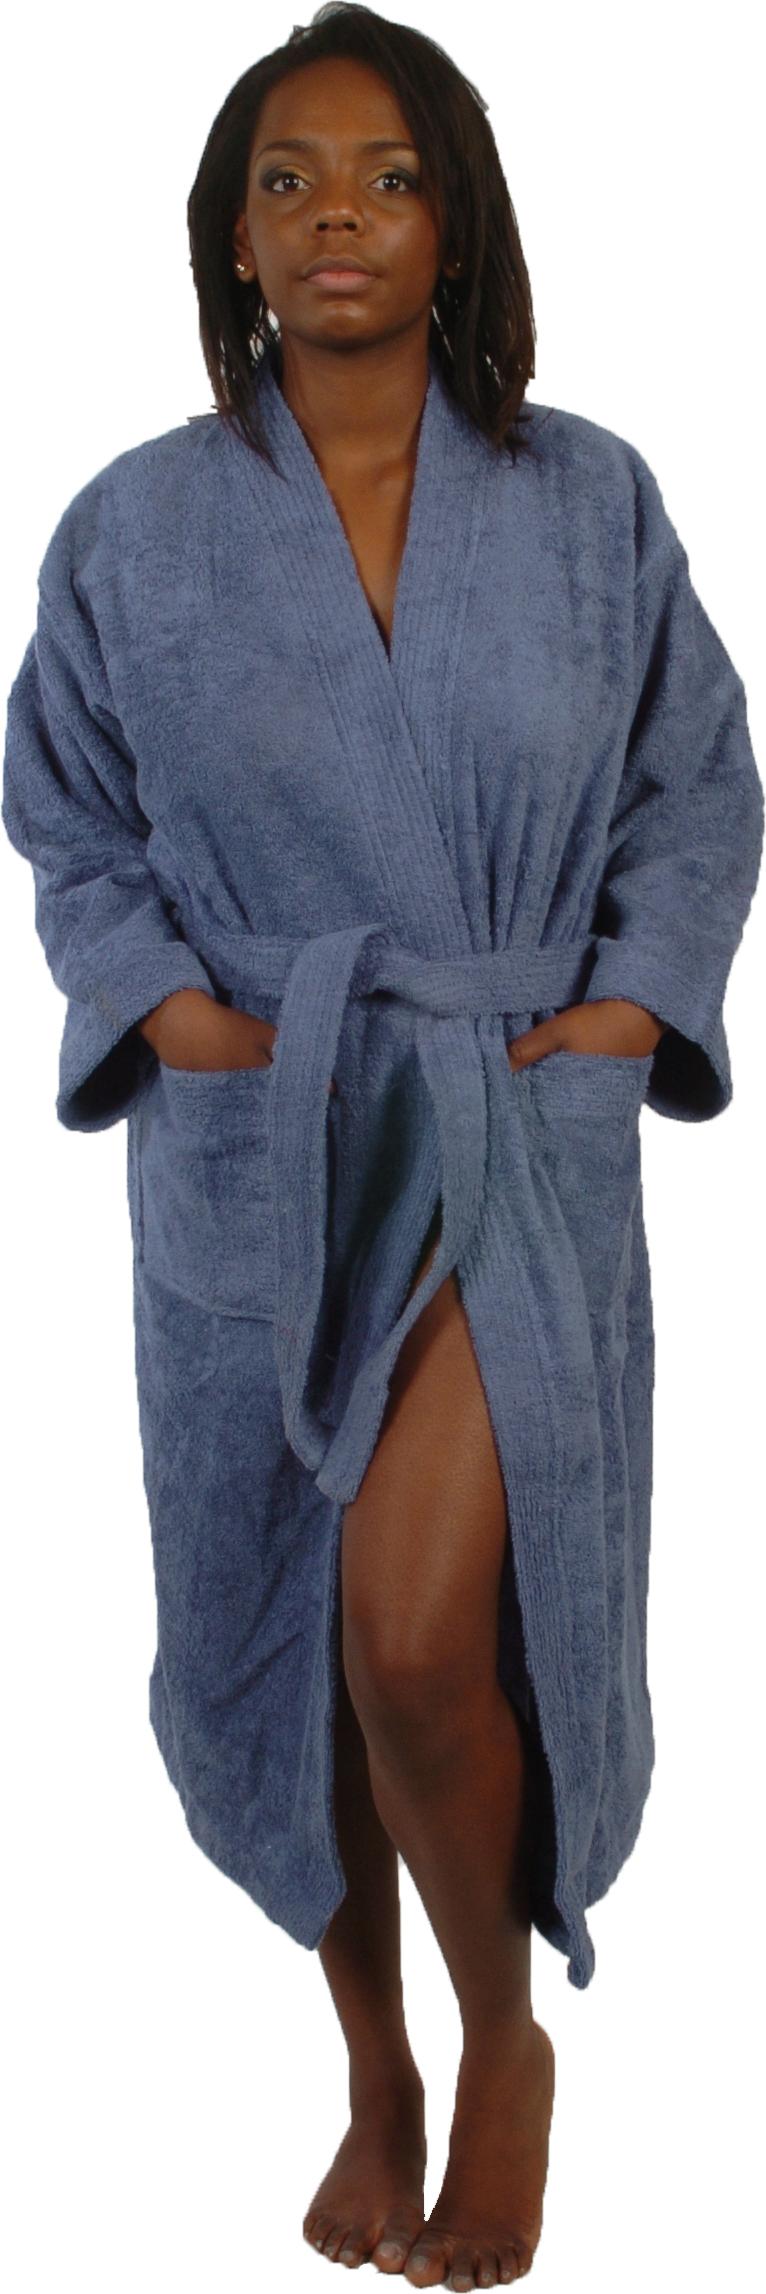 Peignoir col kimono en Coton couleur Bleu jean Taille M (Bleu Jean)